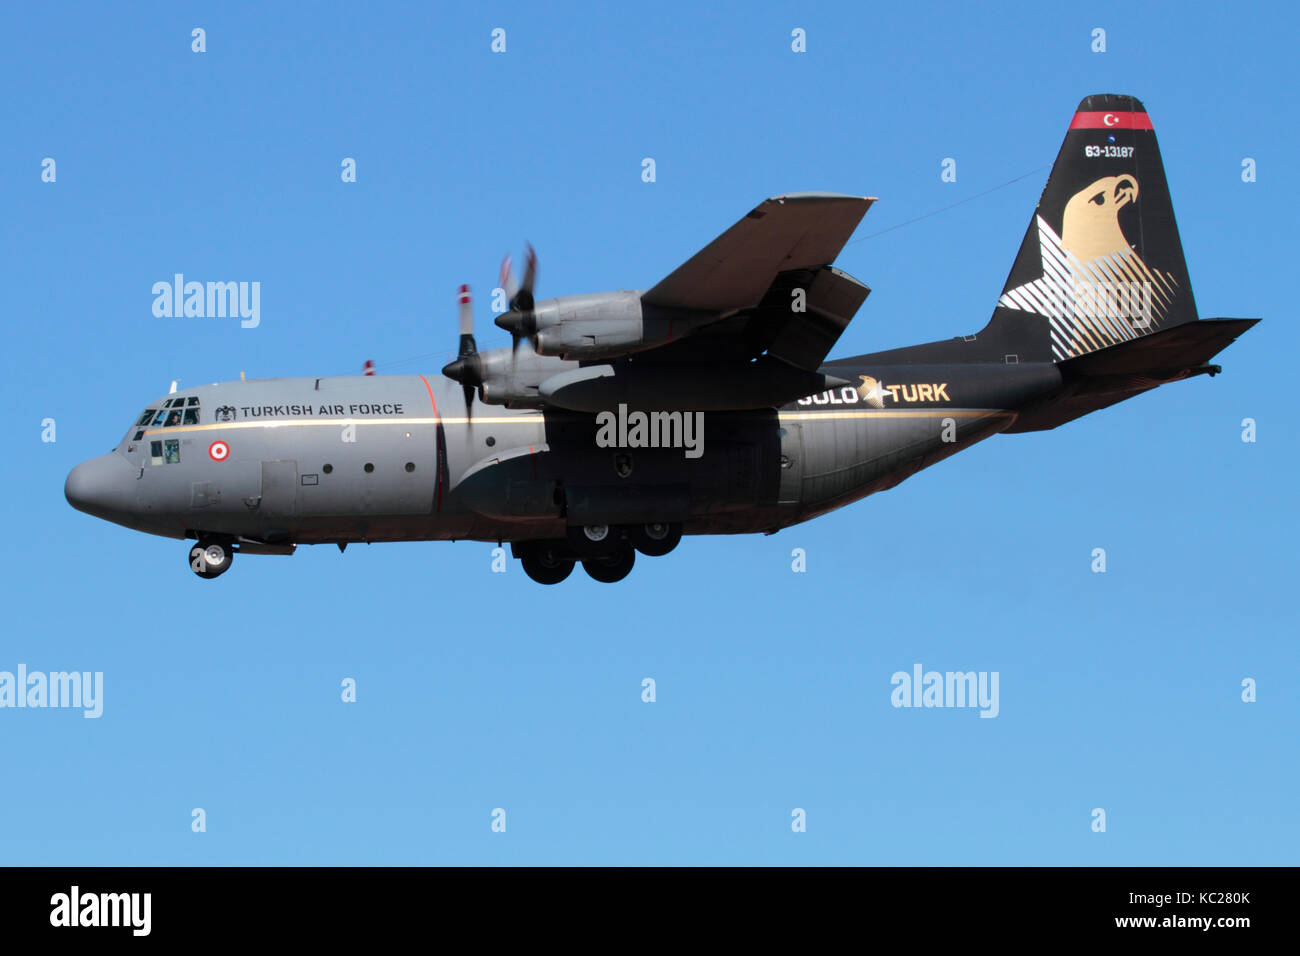 Military aviation. Turkish Air Force Lockheed C-130E Hercules medium tactical airlift aircraft - Stock Image